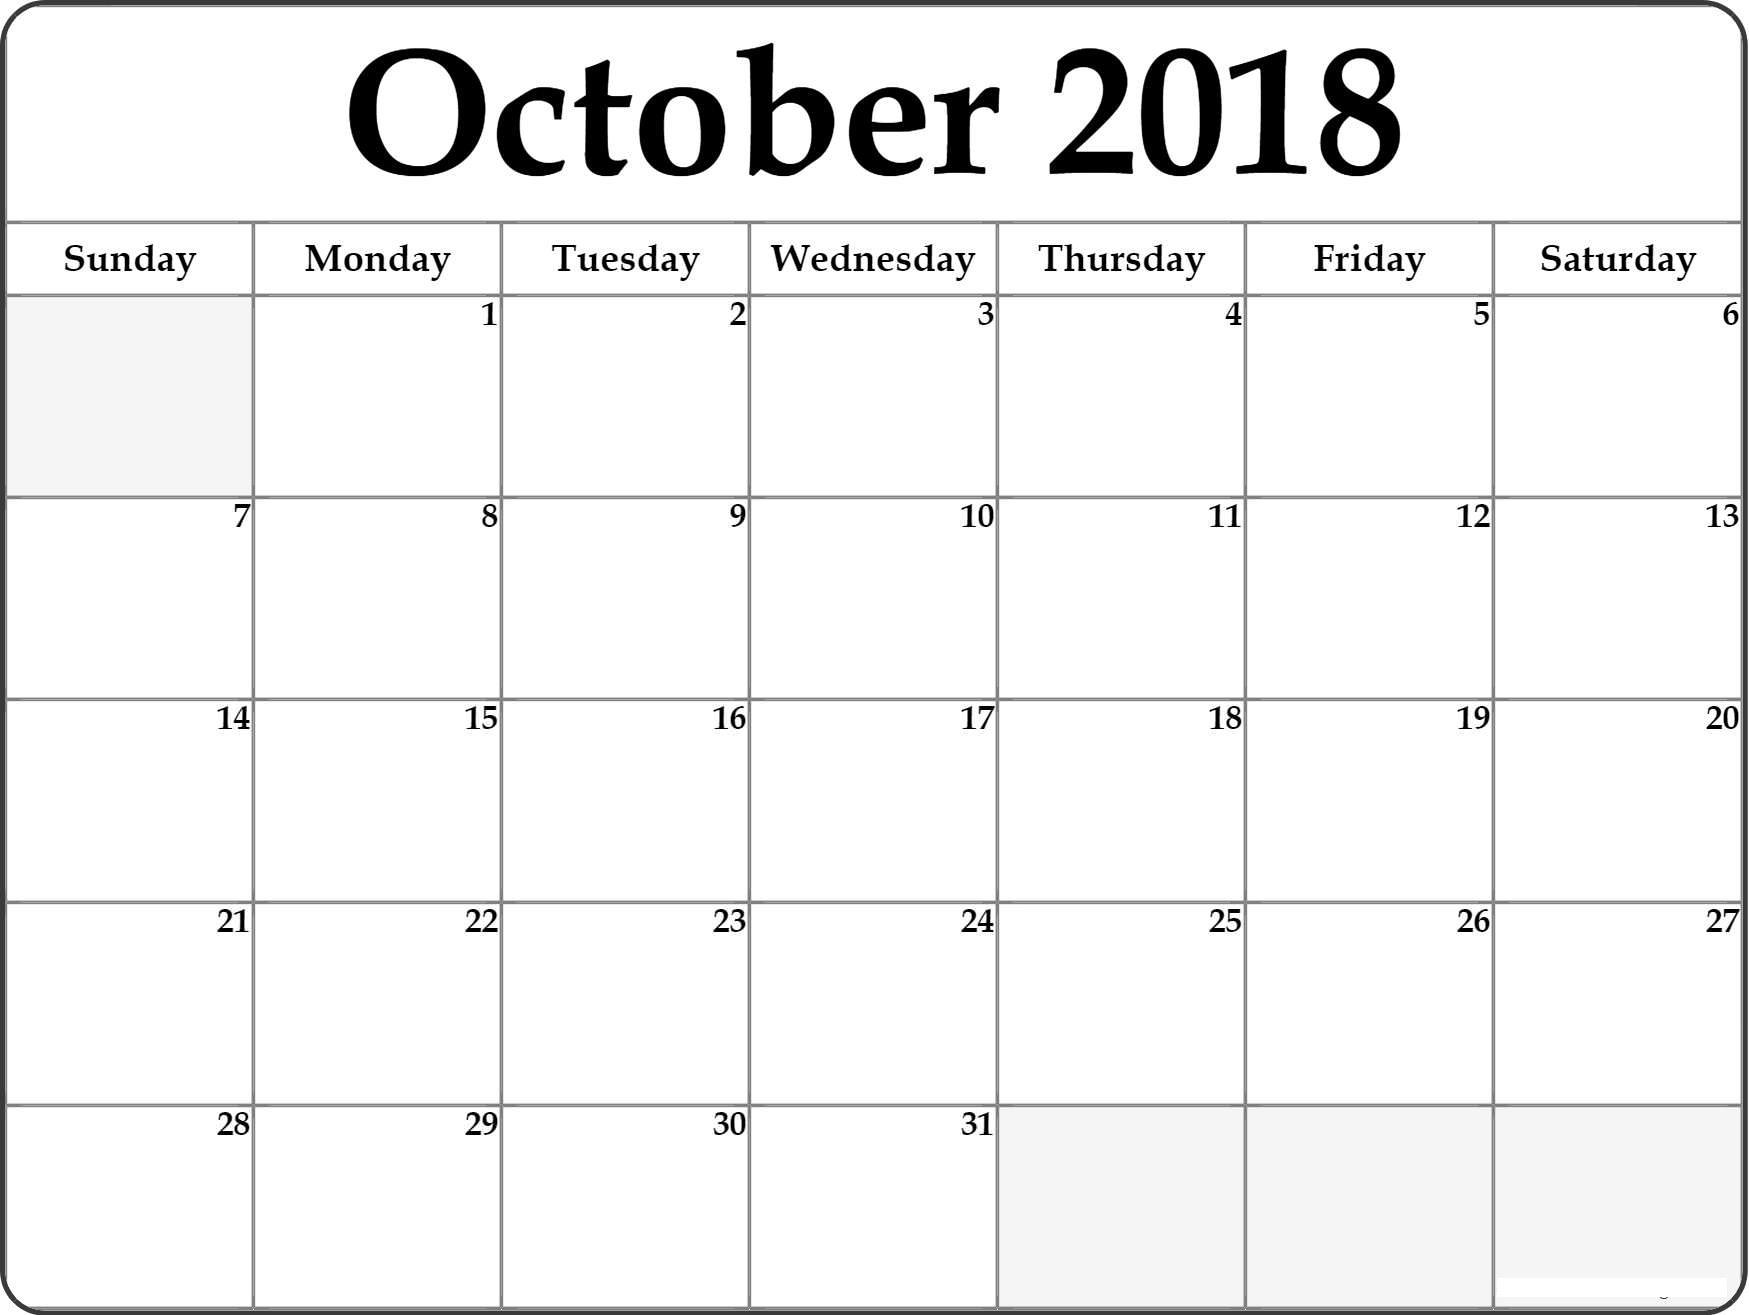 Free October 2018 Calendar Template Printable Download | Free for Calendar October 2019 Nsw Printable